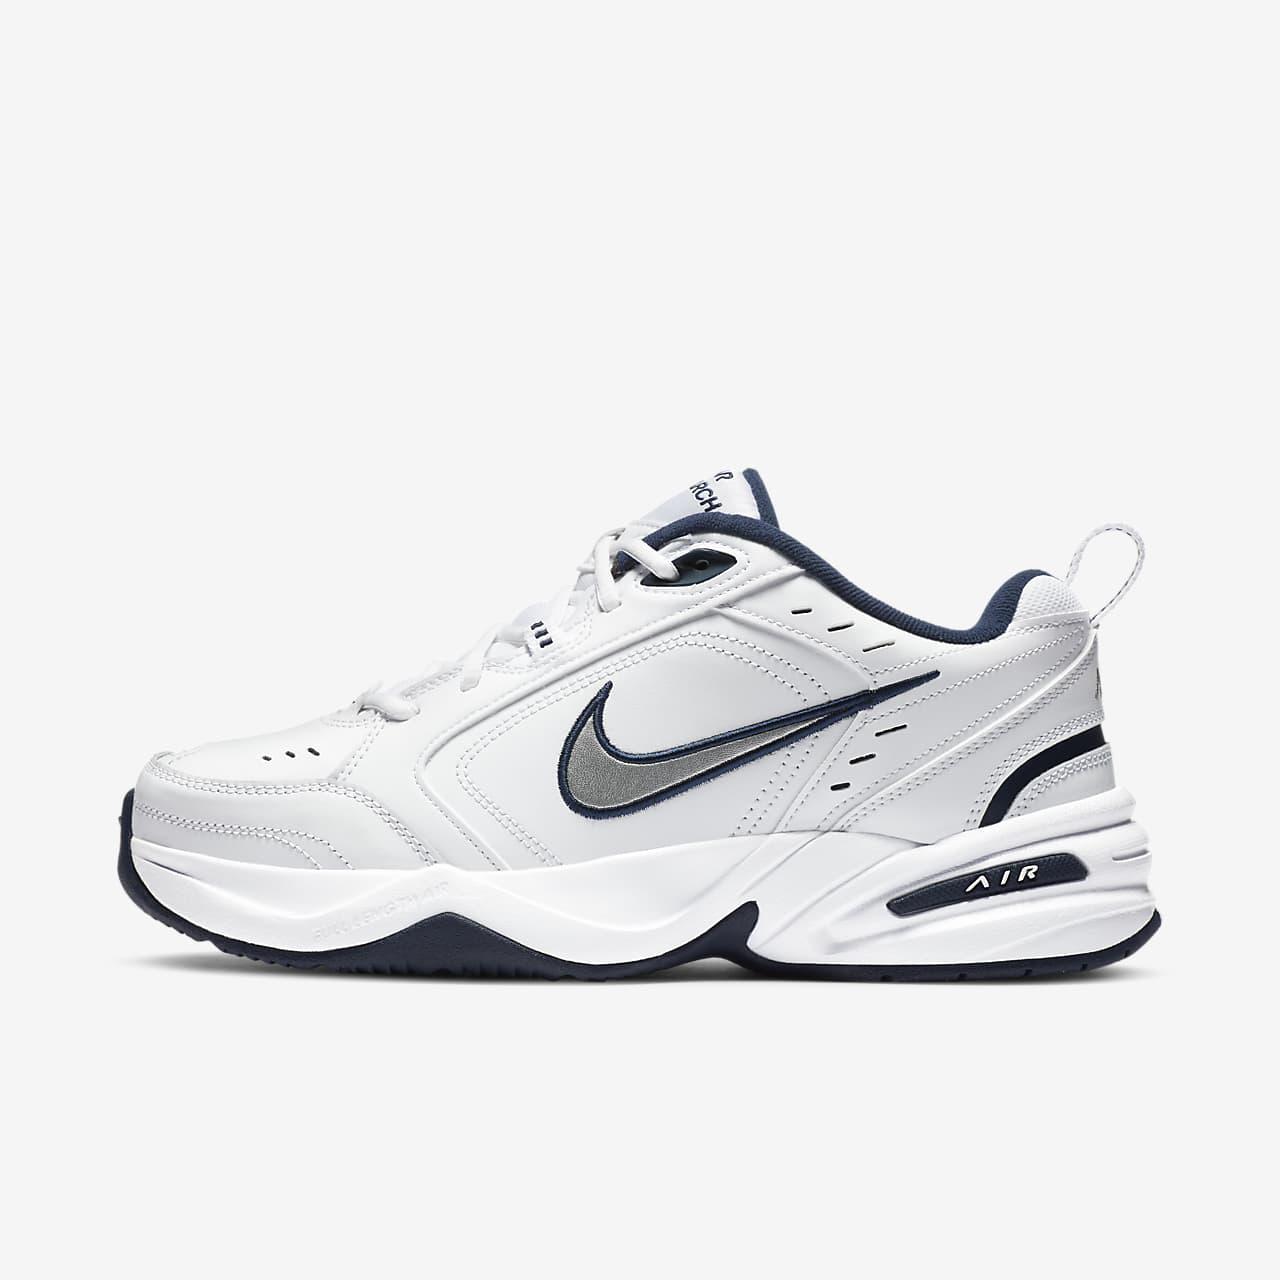 fb370d5fc184f Nike Air Monarch IV Günlük Giyim/Spor Salonu Ayakkabısı. Nike.com TR